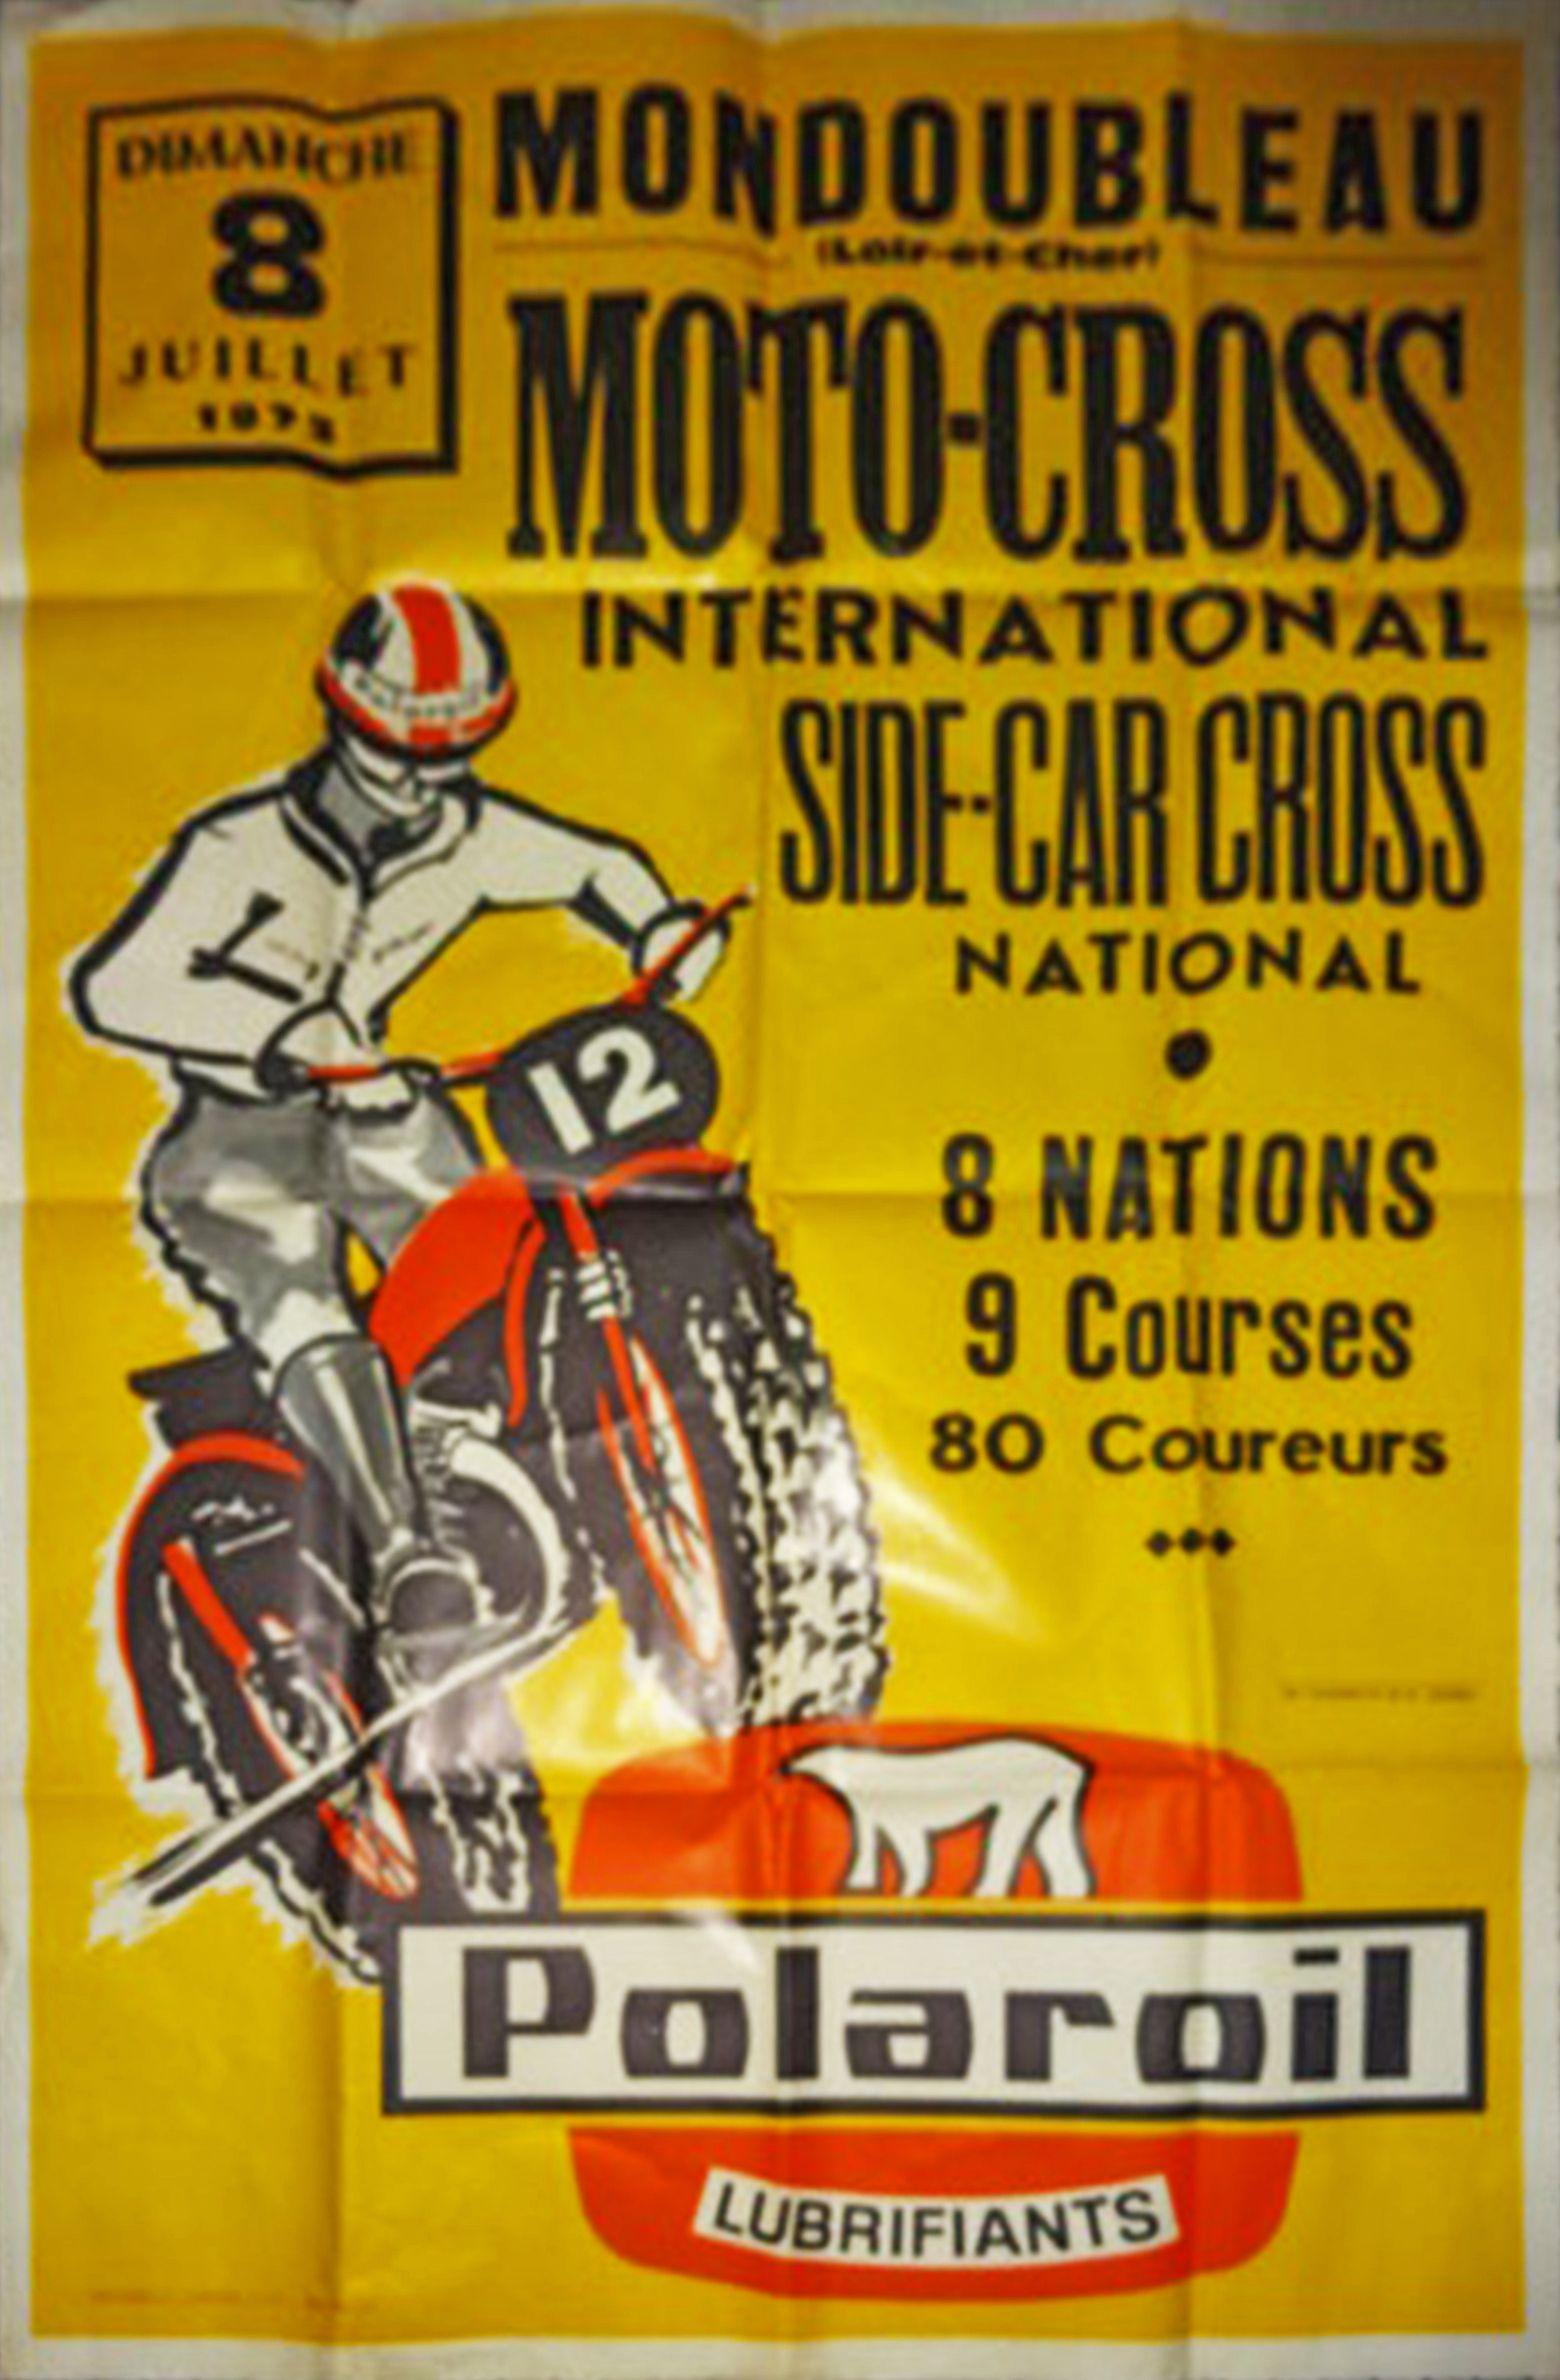 vintage motocross posters | Kid Partys | Pinterest | Motocross ...